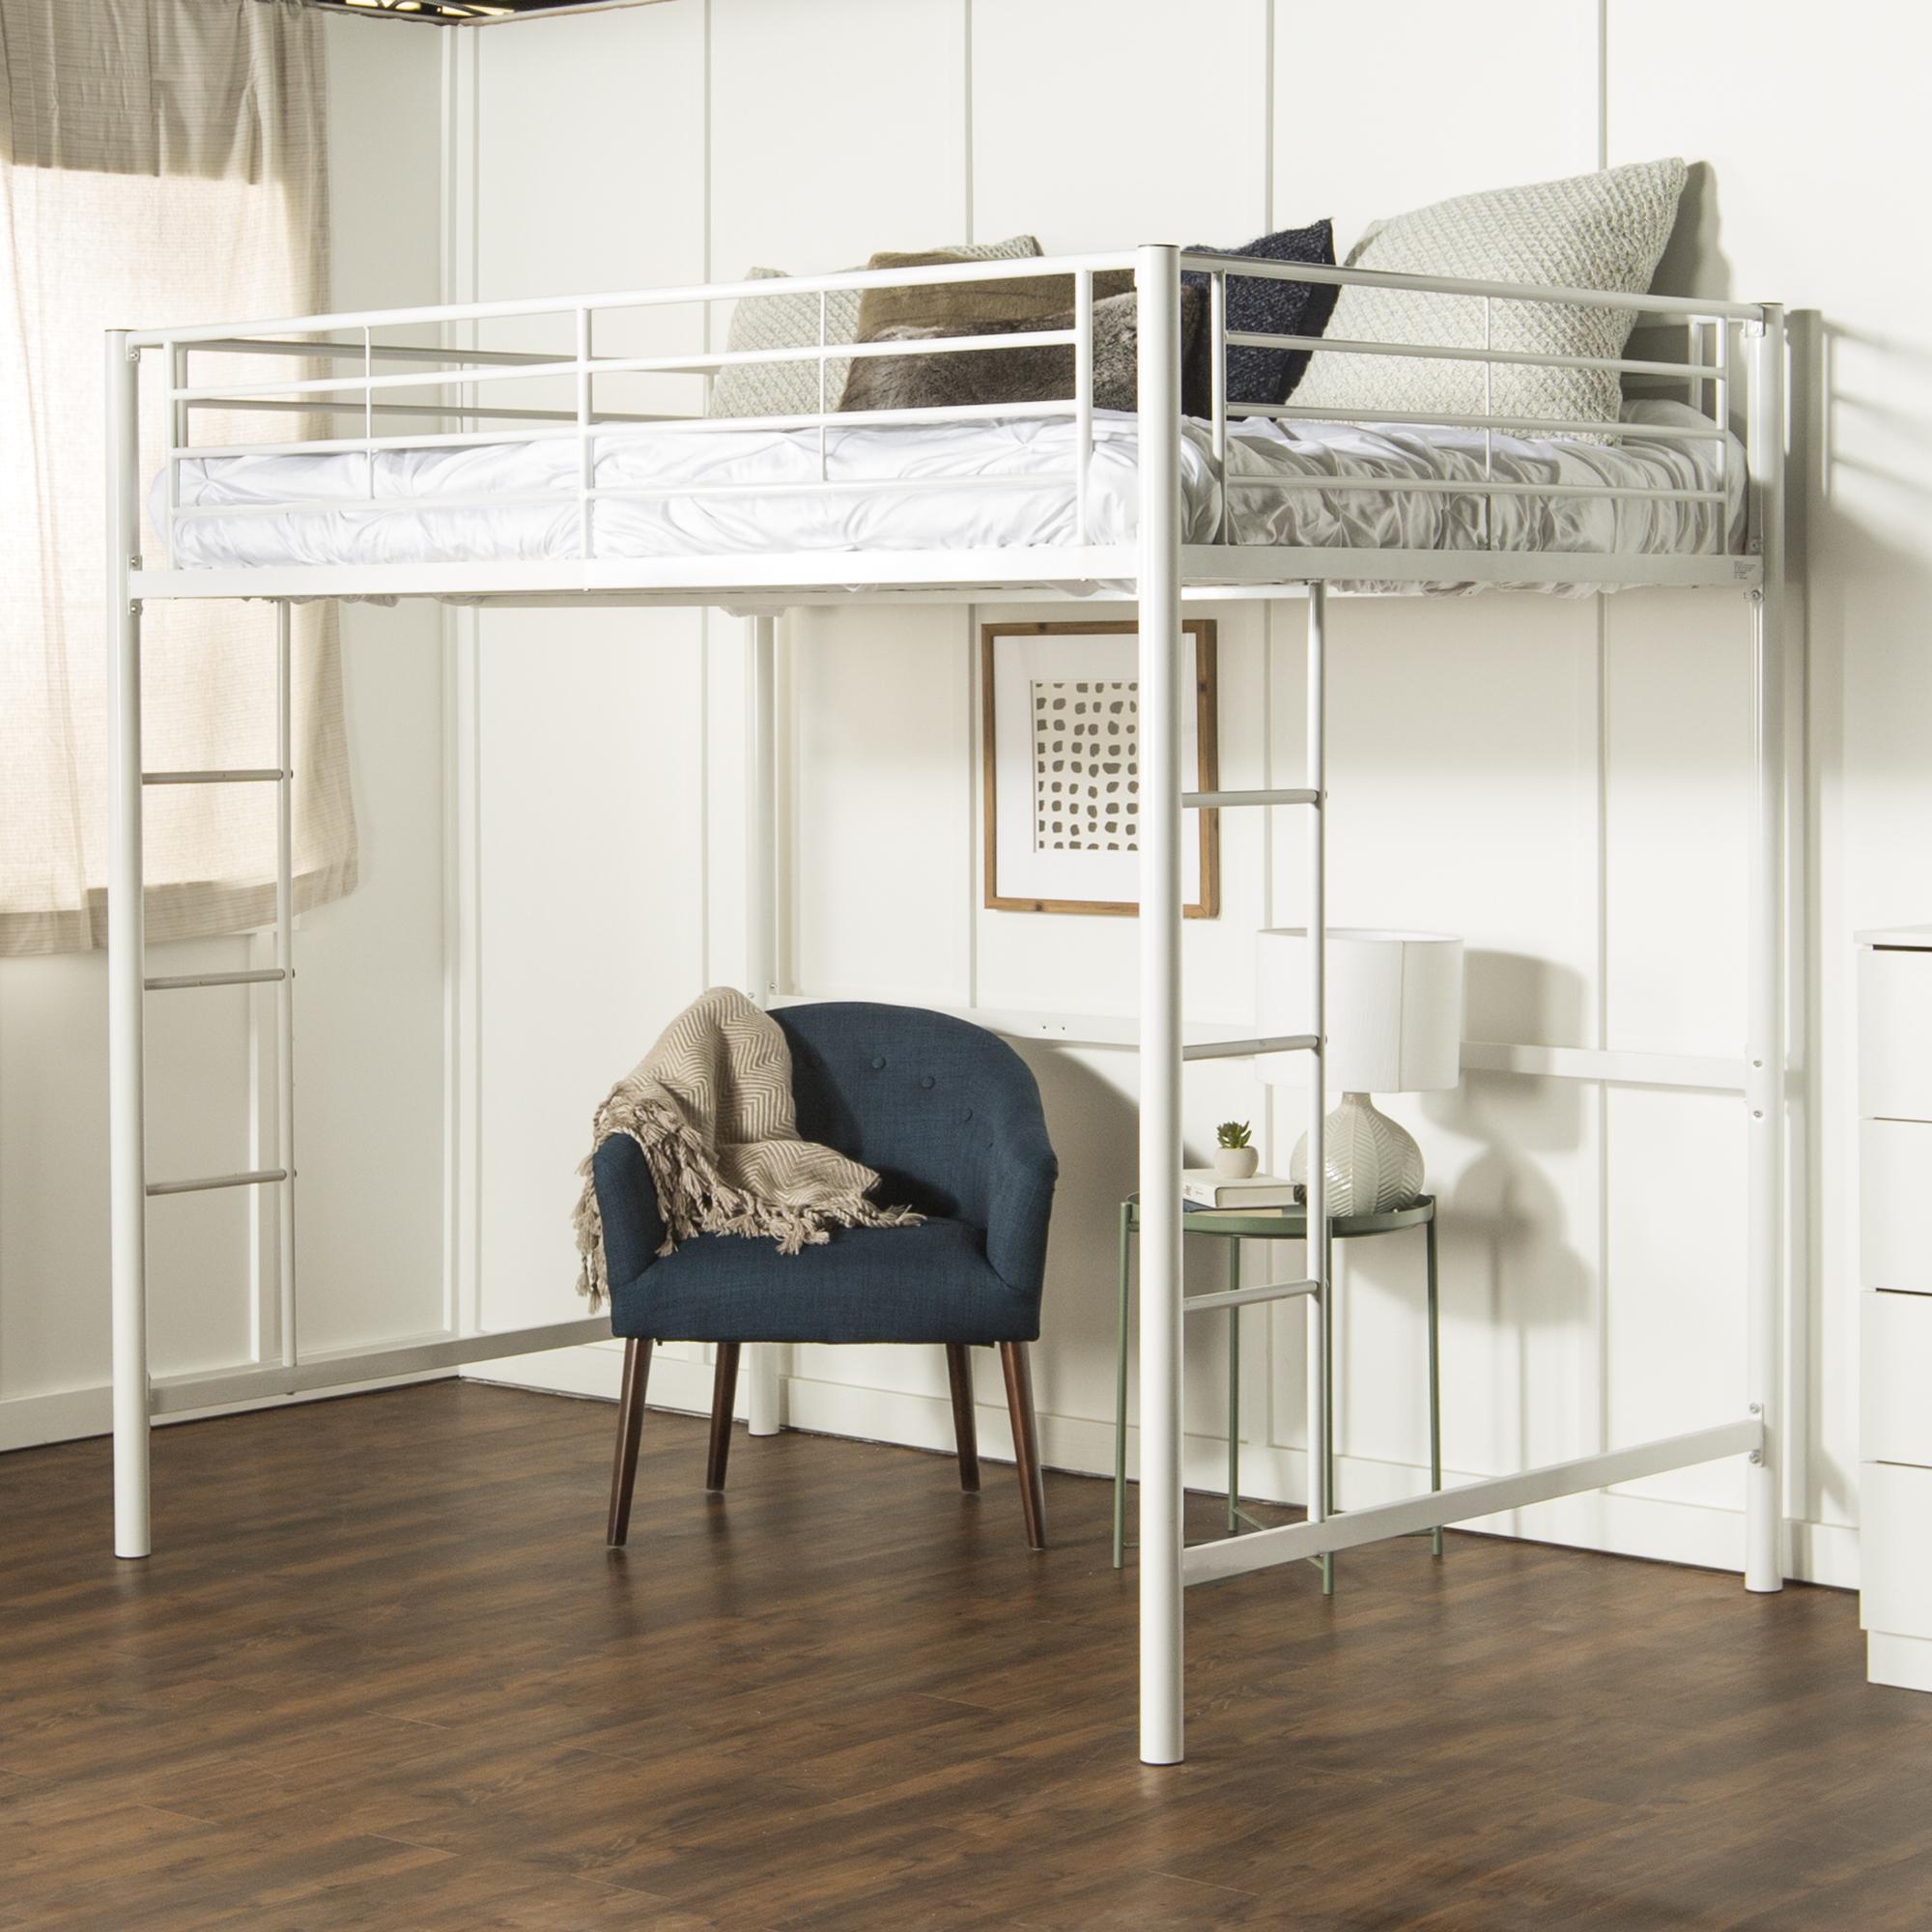 premium metal full size loft bed white ebay. Black Bedroom Furniture Sets. Home Design Ideas